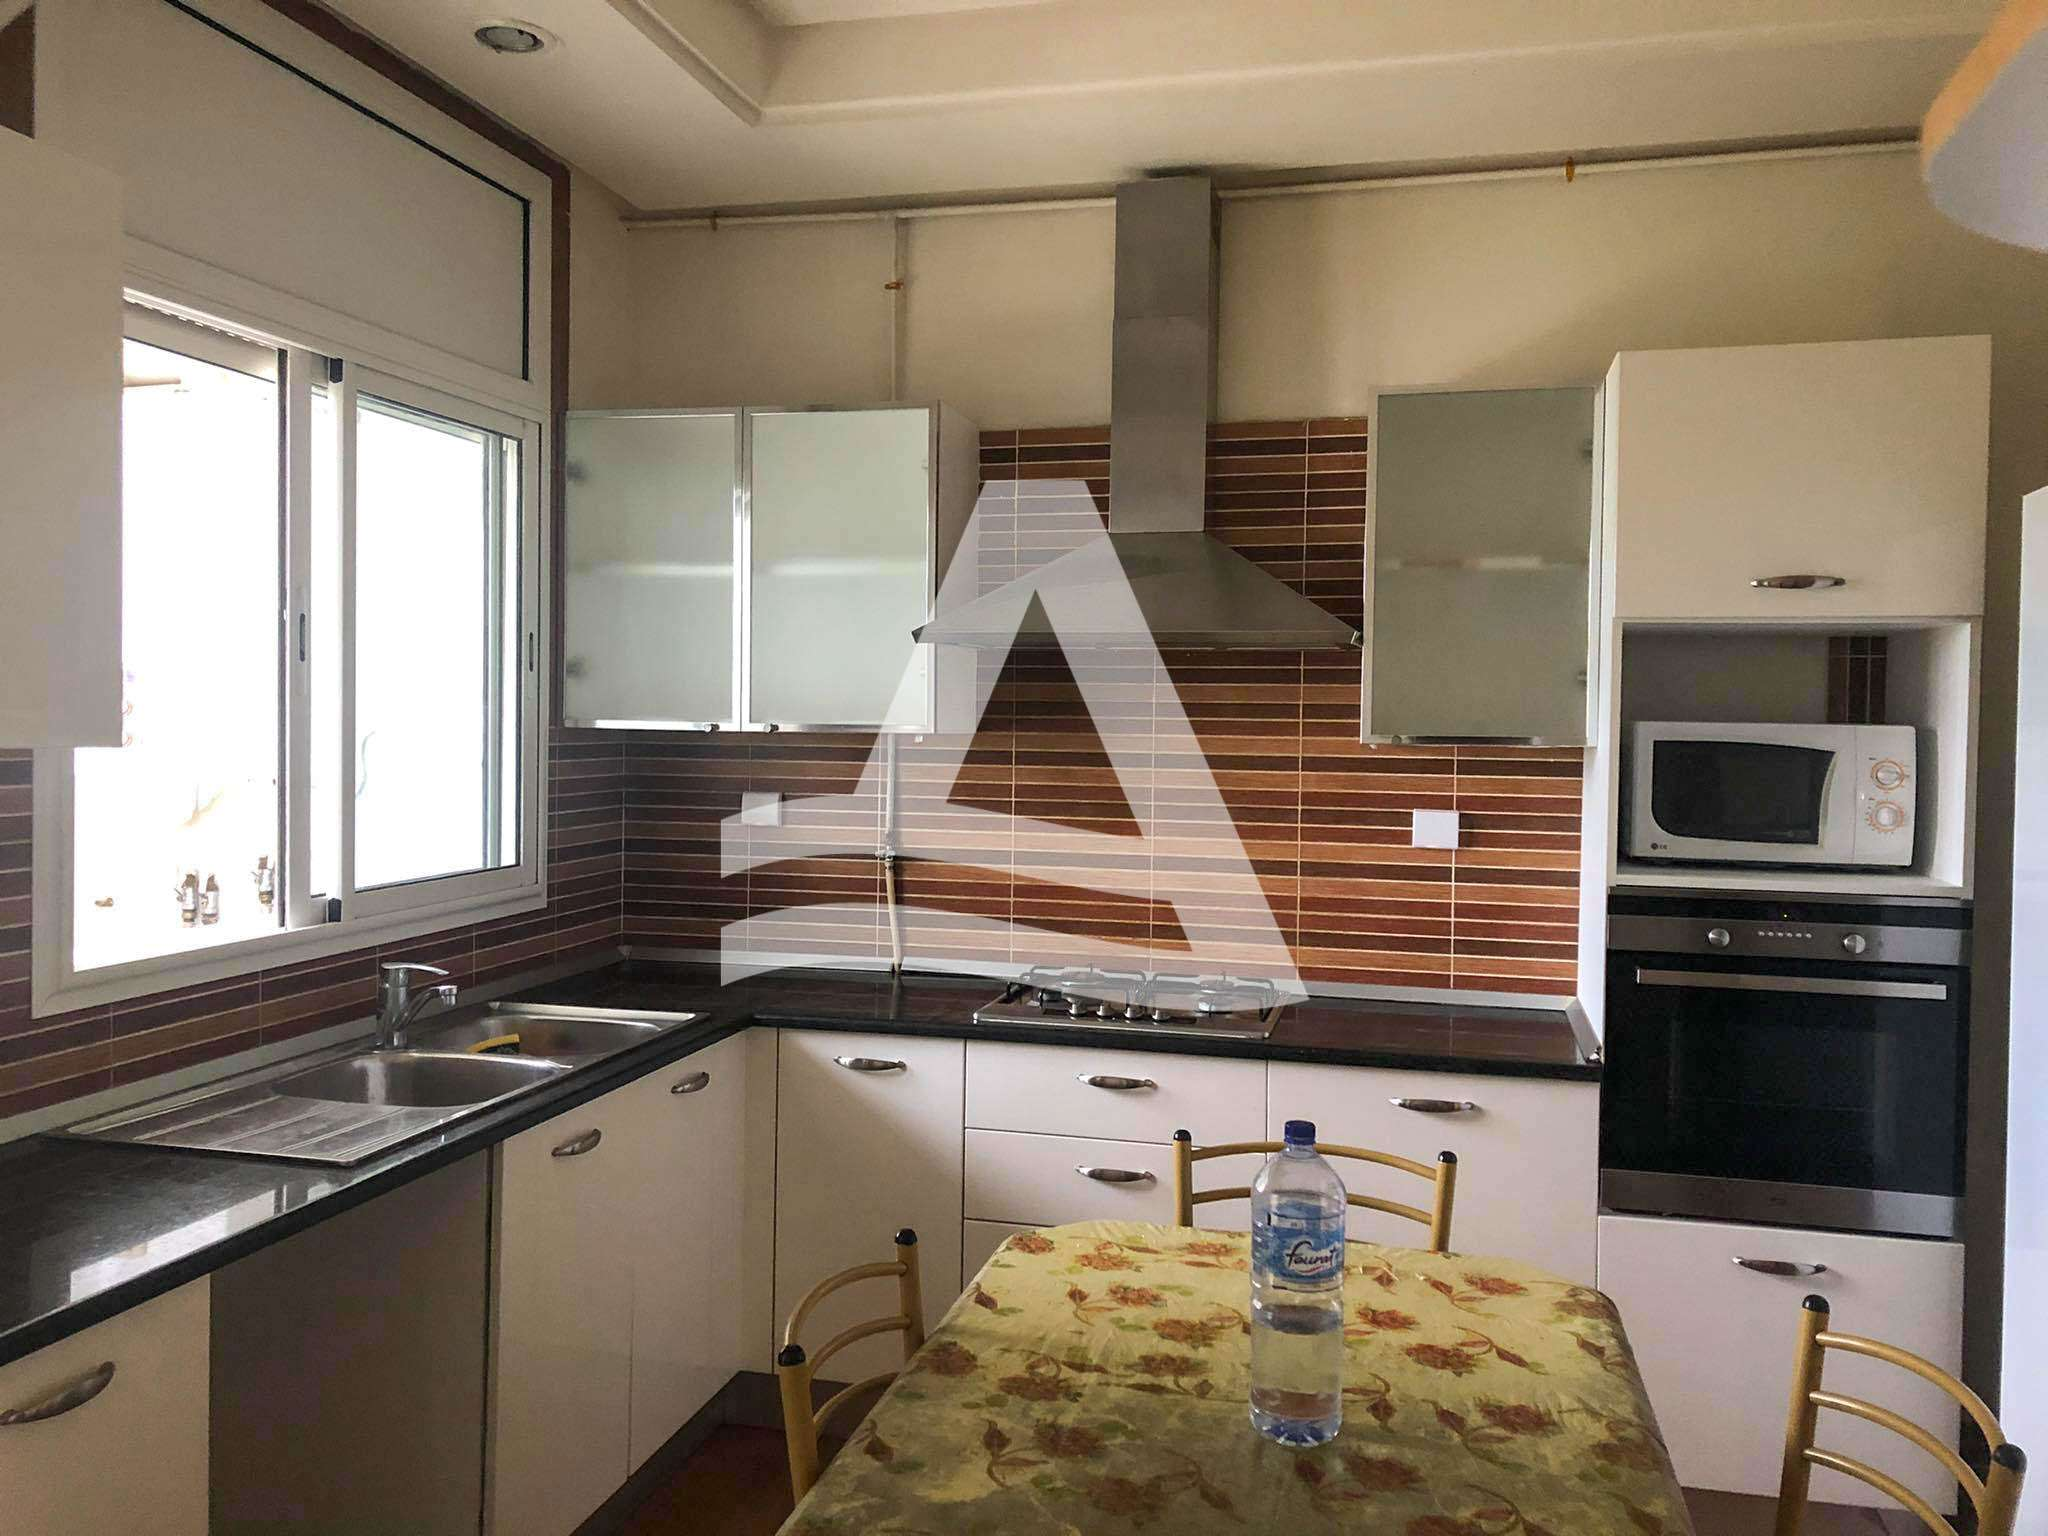 httpss3.amazonaws.comlogimoaws4845366271608282243appartement_jardin_de_carthage_13_sur_16